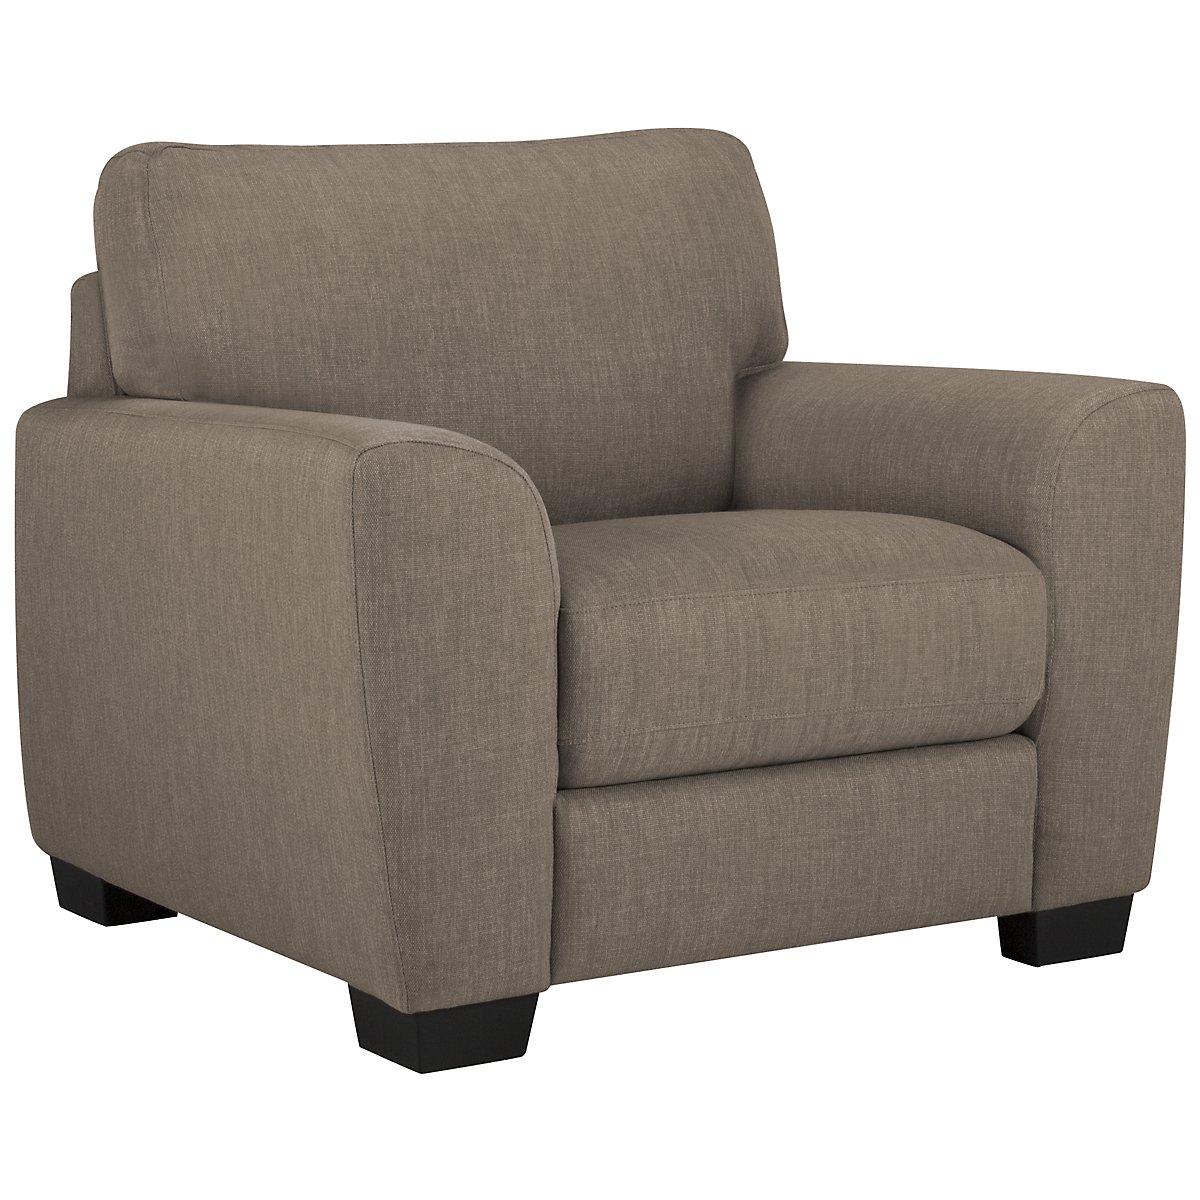 Fallon Light Gray Fabric Chair